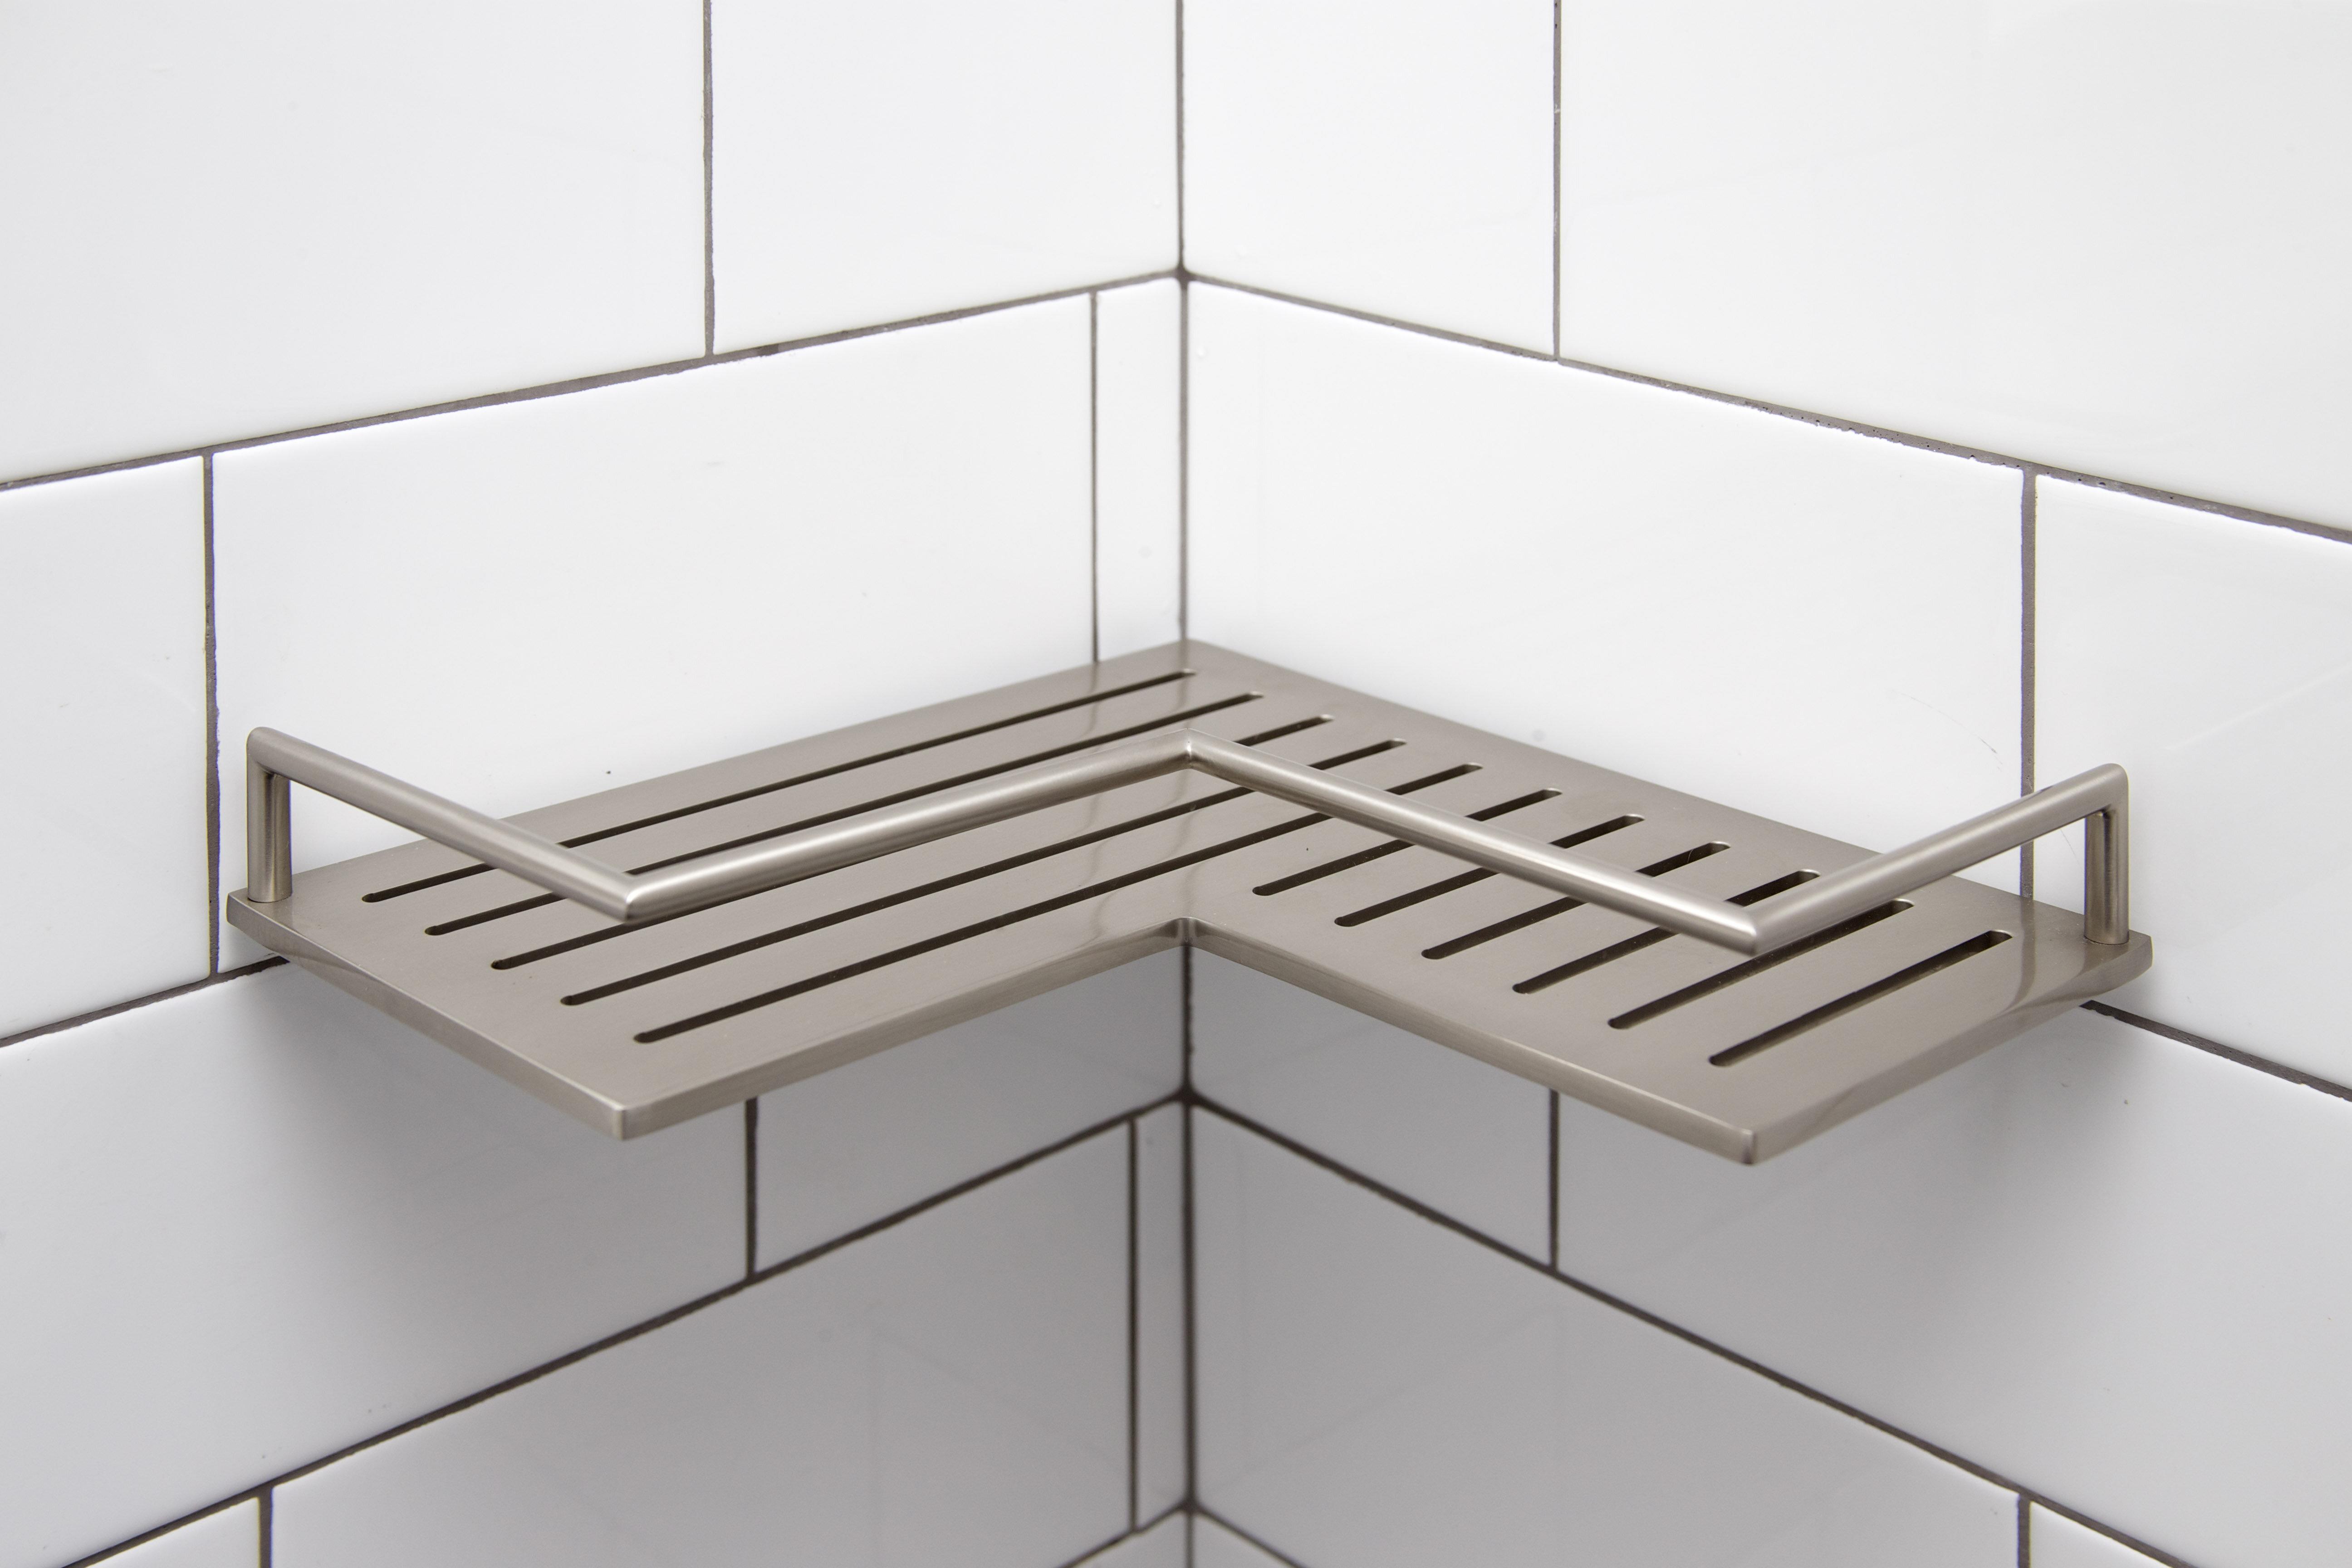 Ginger Surface Stainless Steel Shower Shelf & Reviews | Wayfair